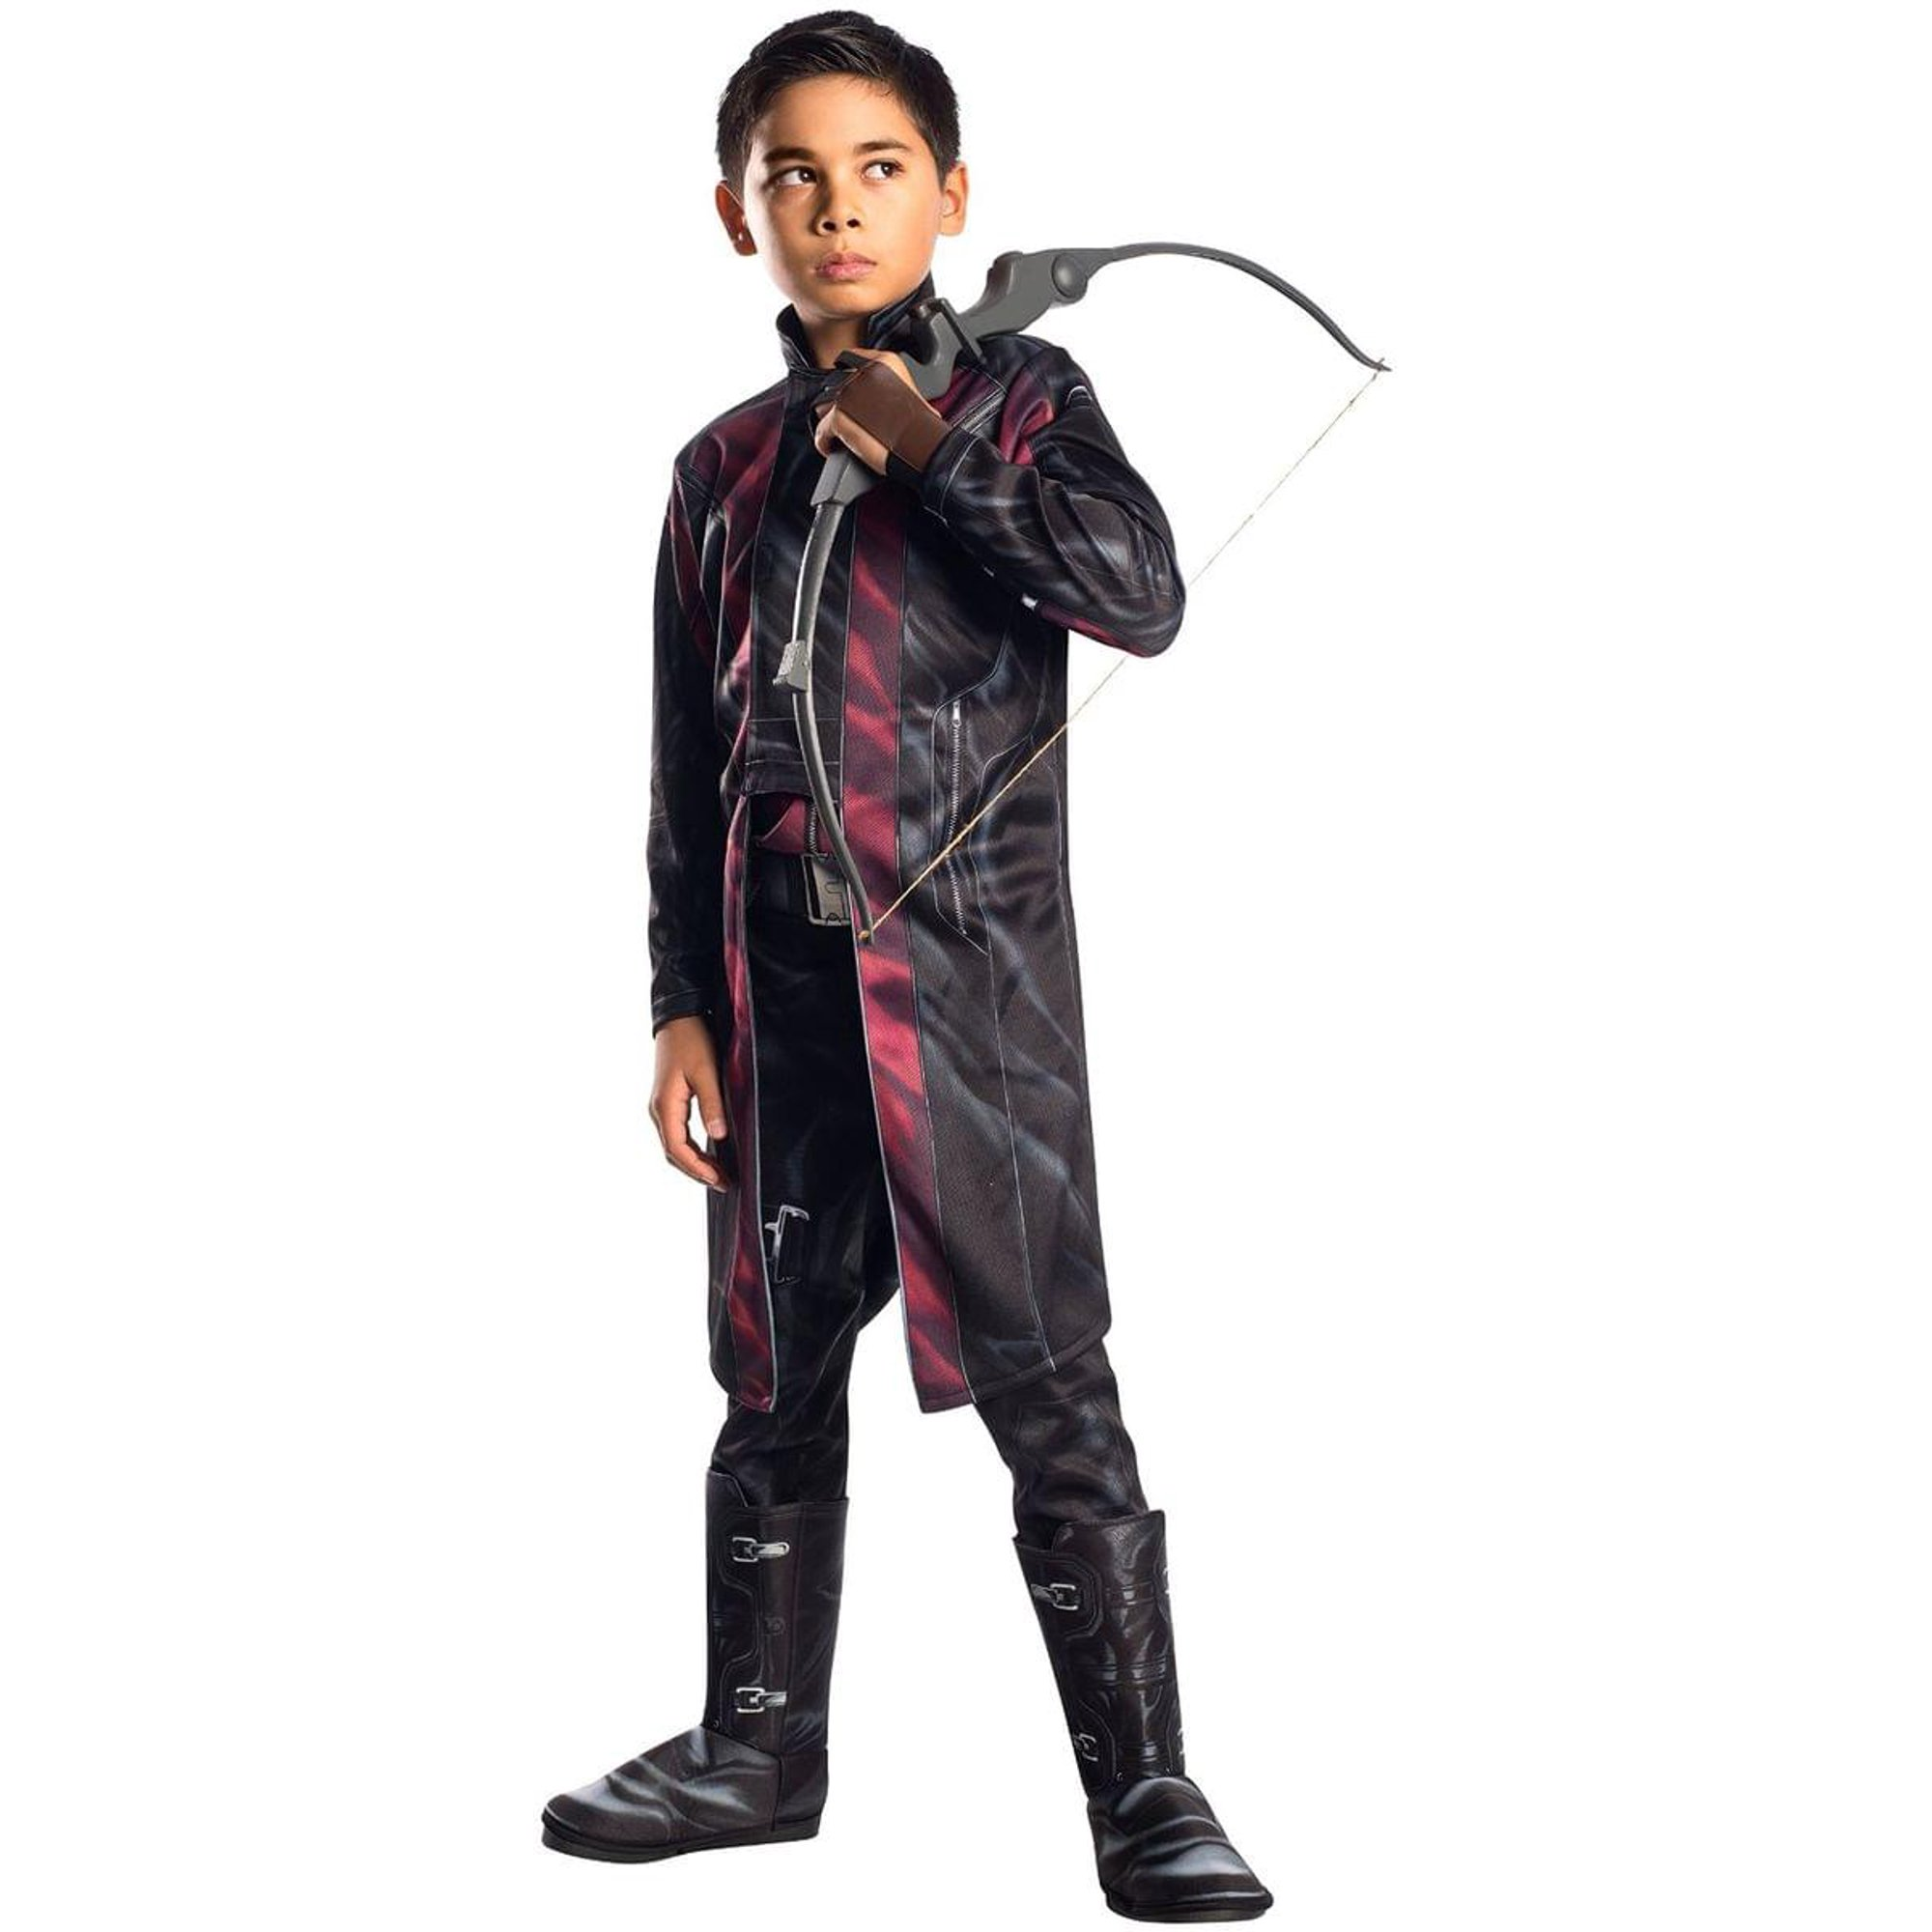 Tony Stark Halloween Costume.Avengers 2 Deluxe Hawkeye Costume Child Small Walmart Canada